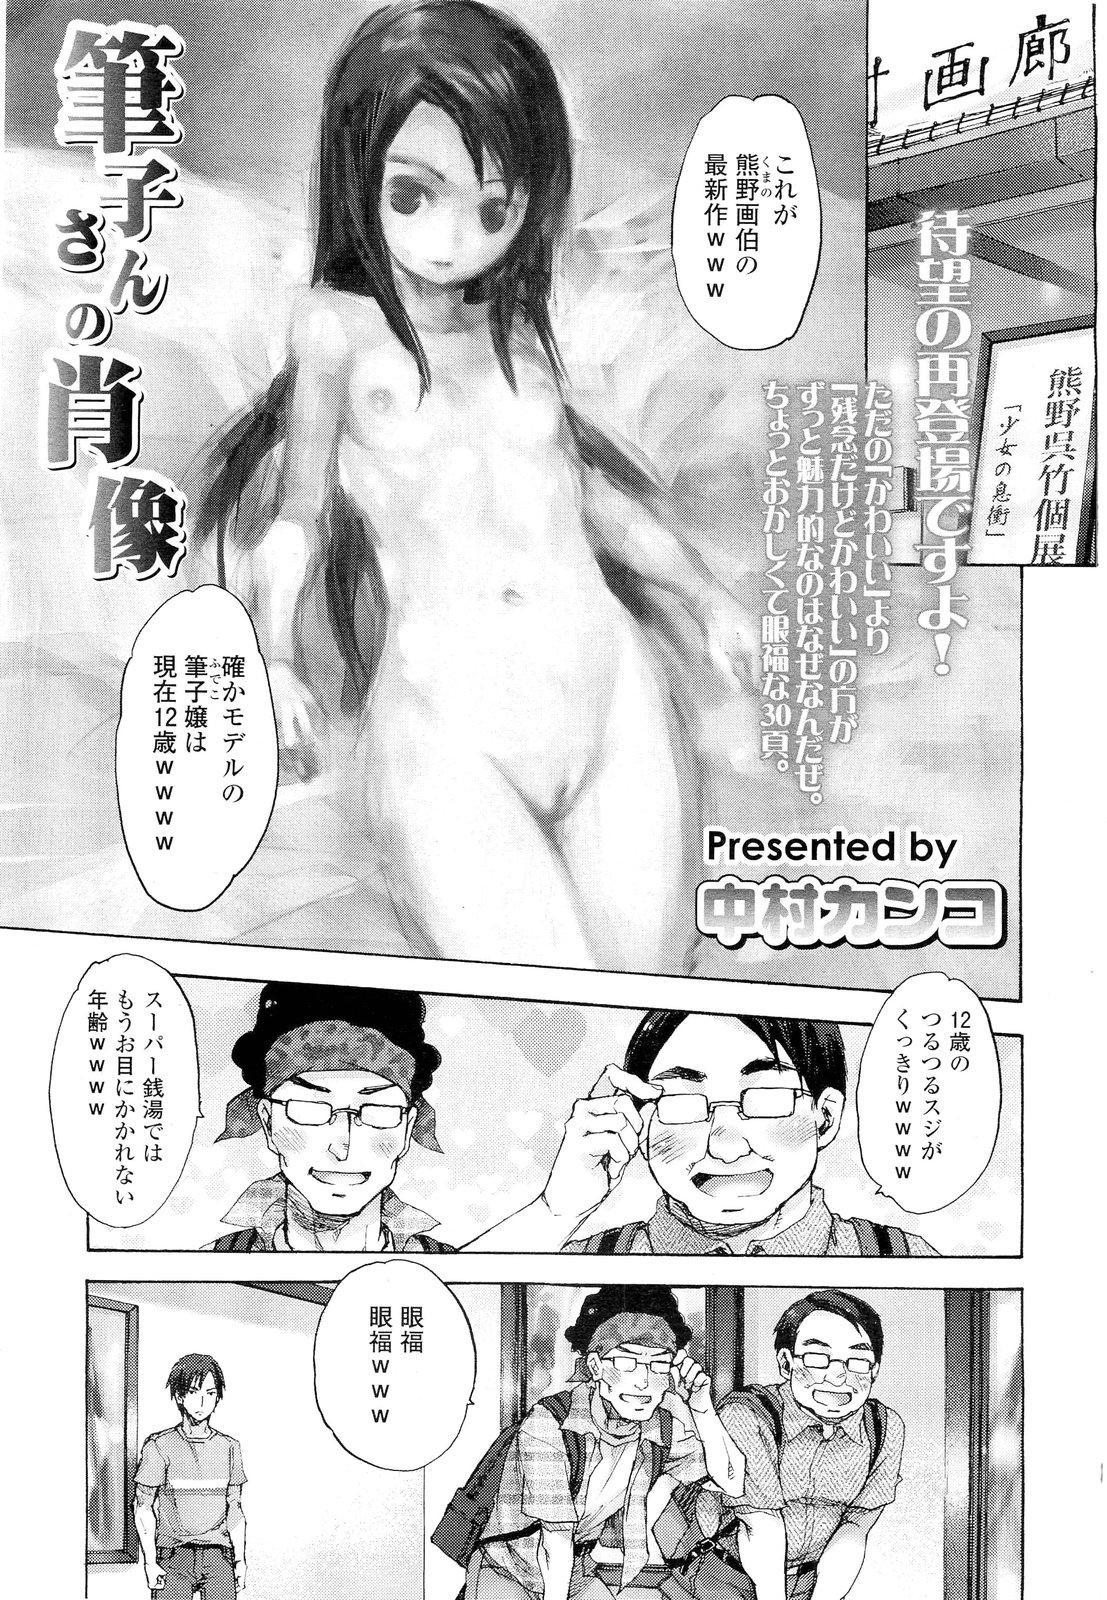 COMIC LO 2012-05 Vol. 98 2